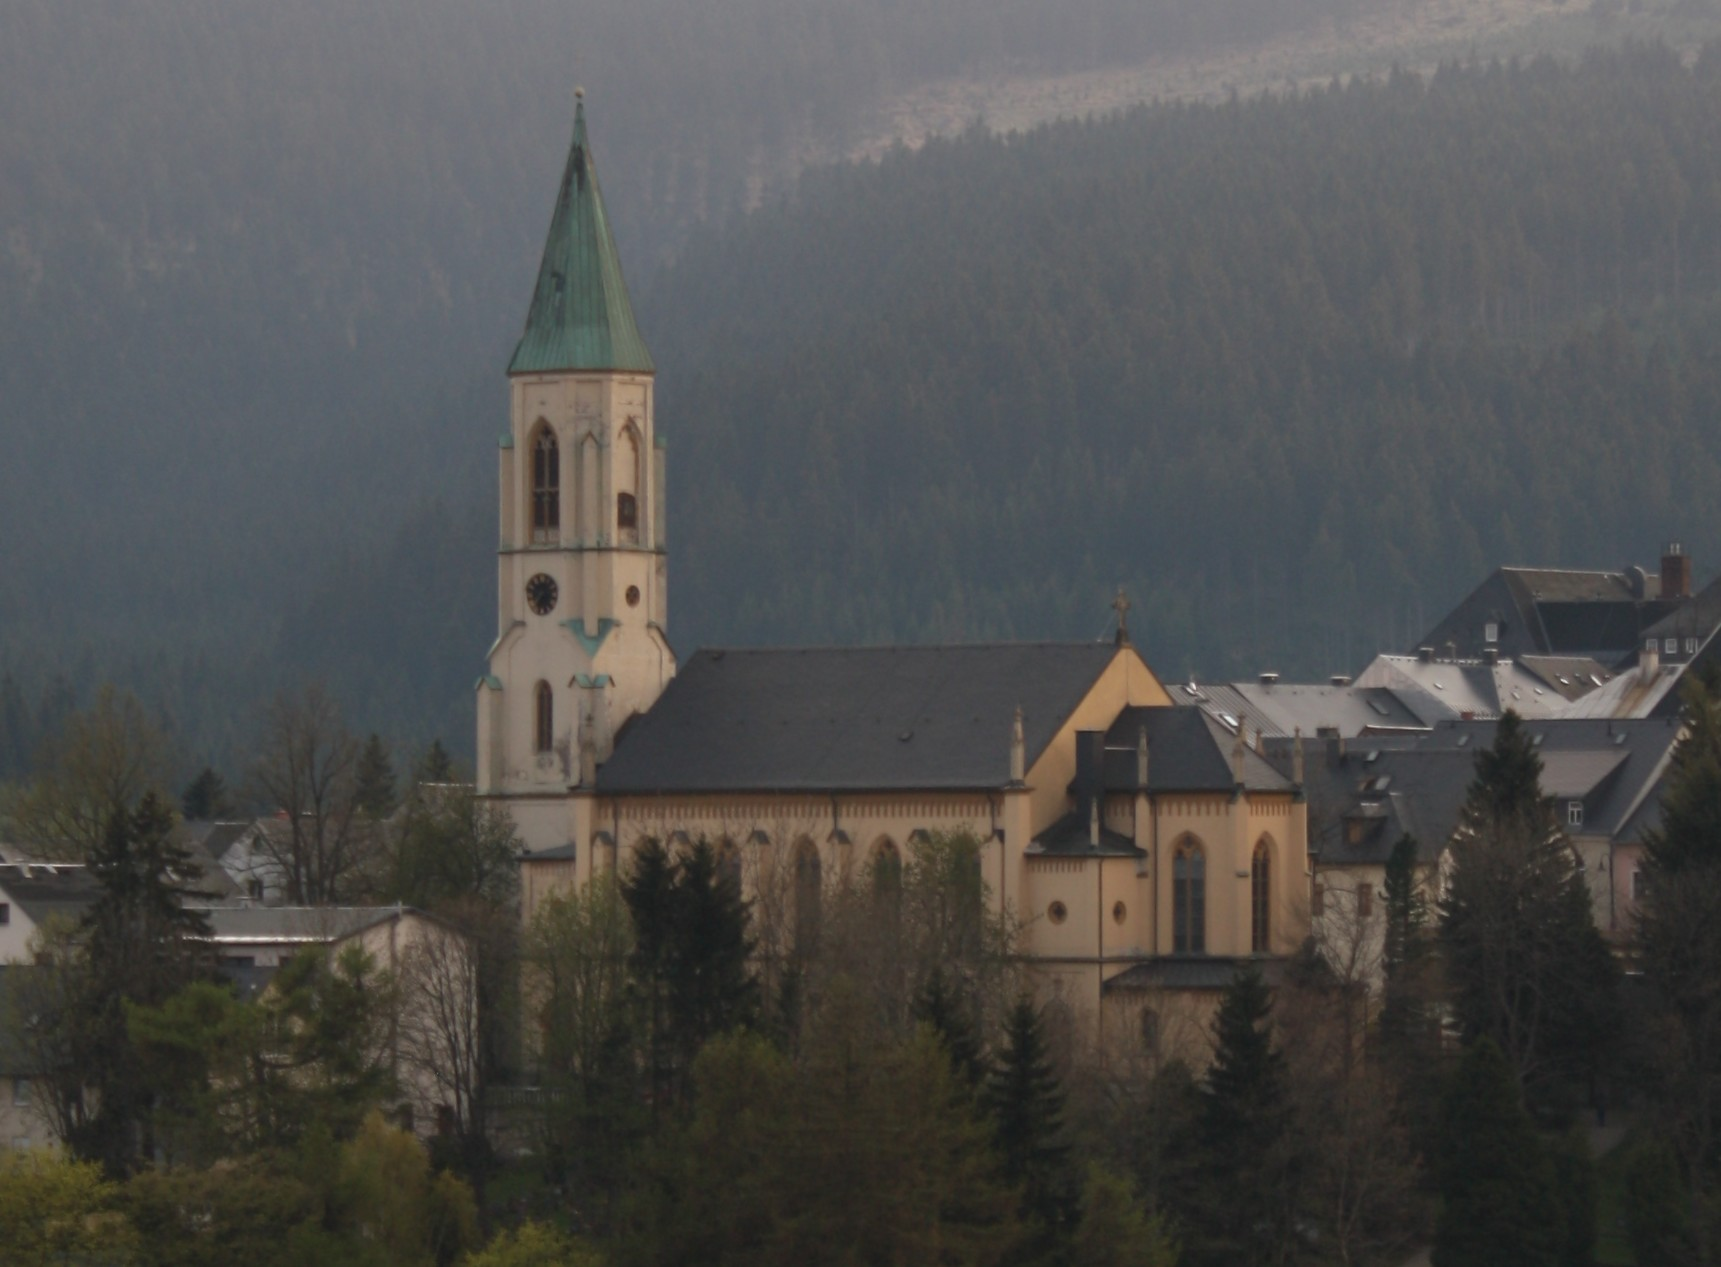 Oberwiesenthal Germany  city photos gallery : Kirche Oberwiesenthal Wikimedia Commons